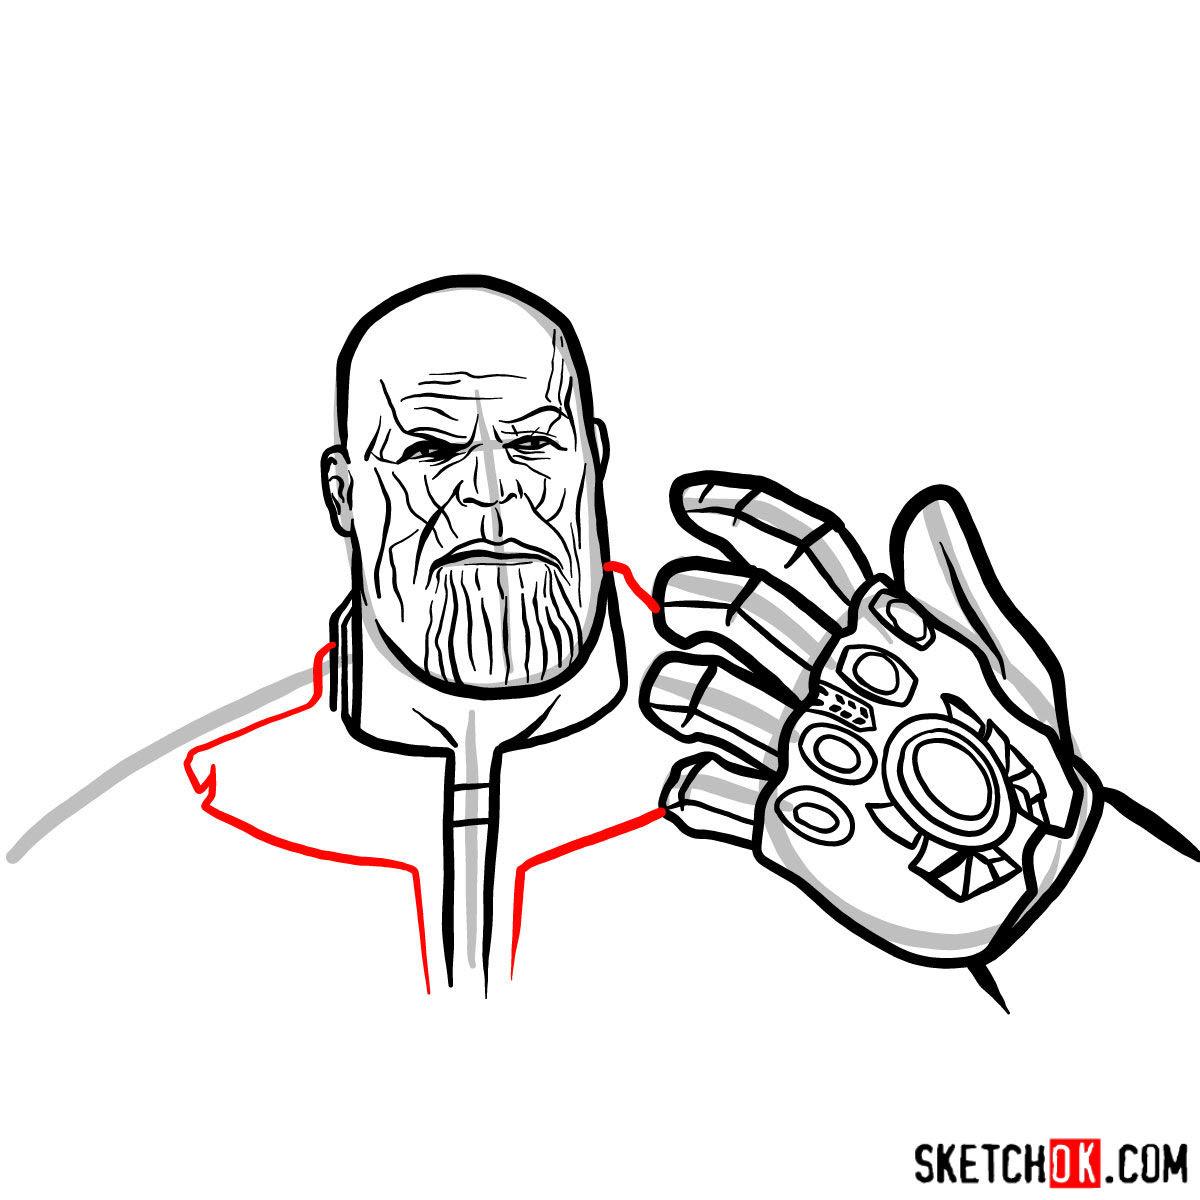 Coloriage A Imprimer Avengers Infinity War Wwwpapedelcacom